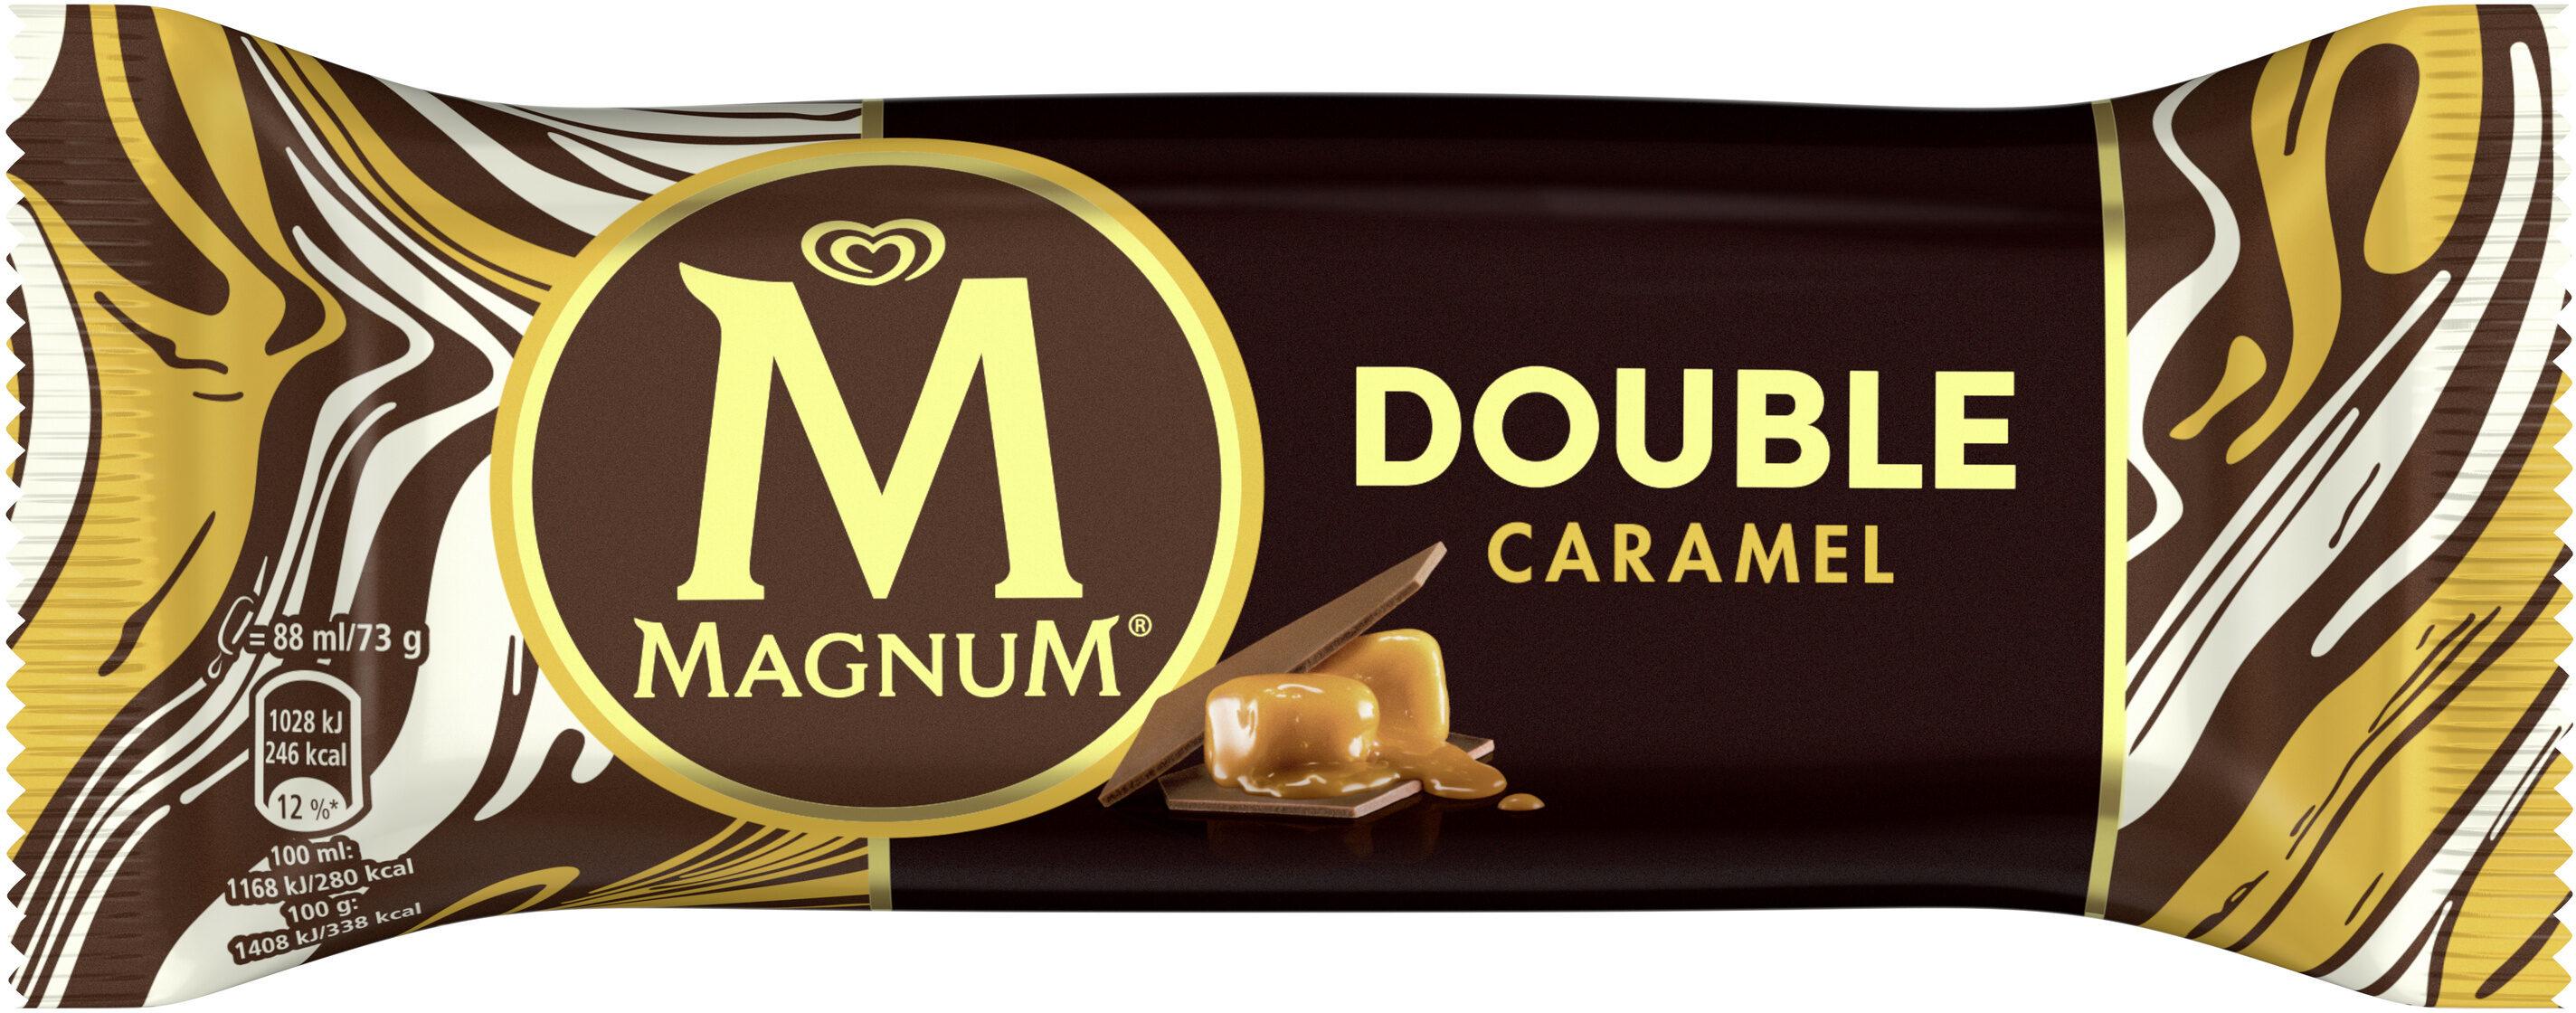 magnum double caramel sverige